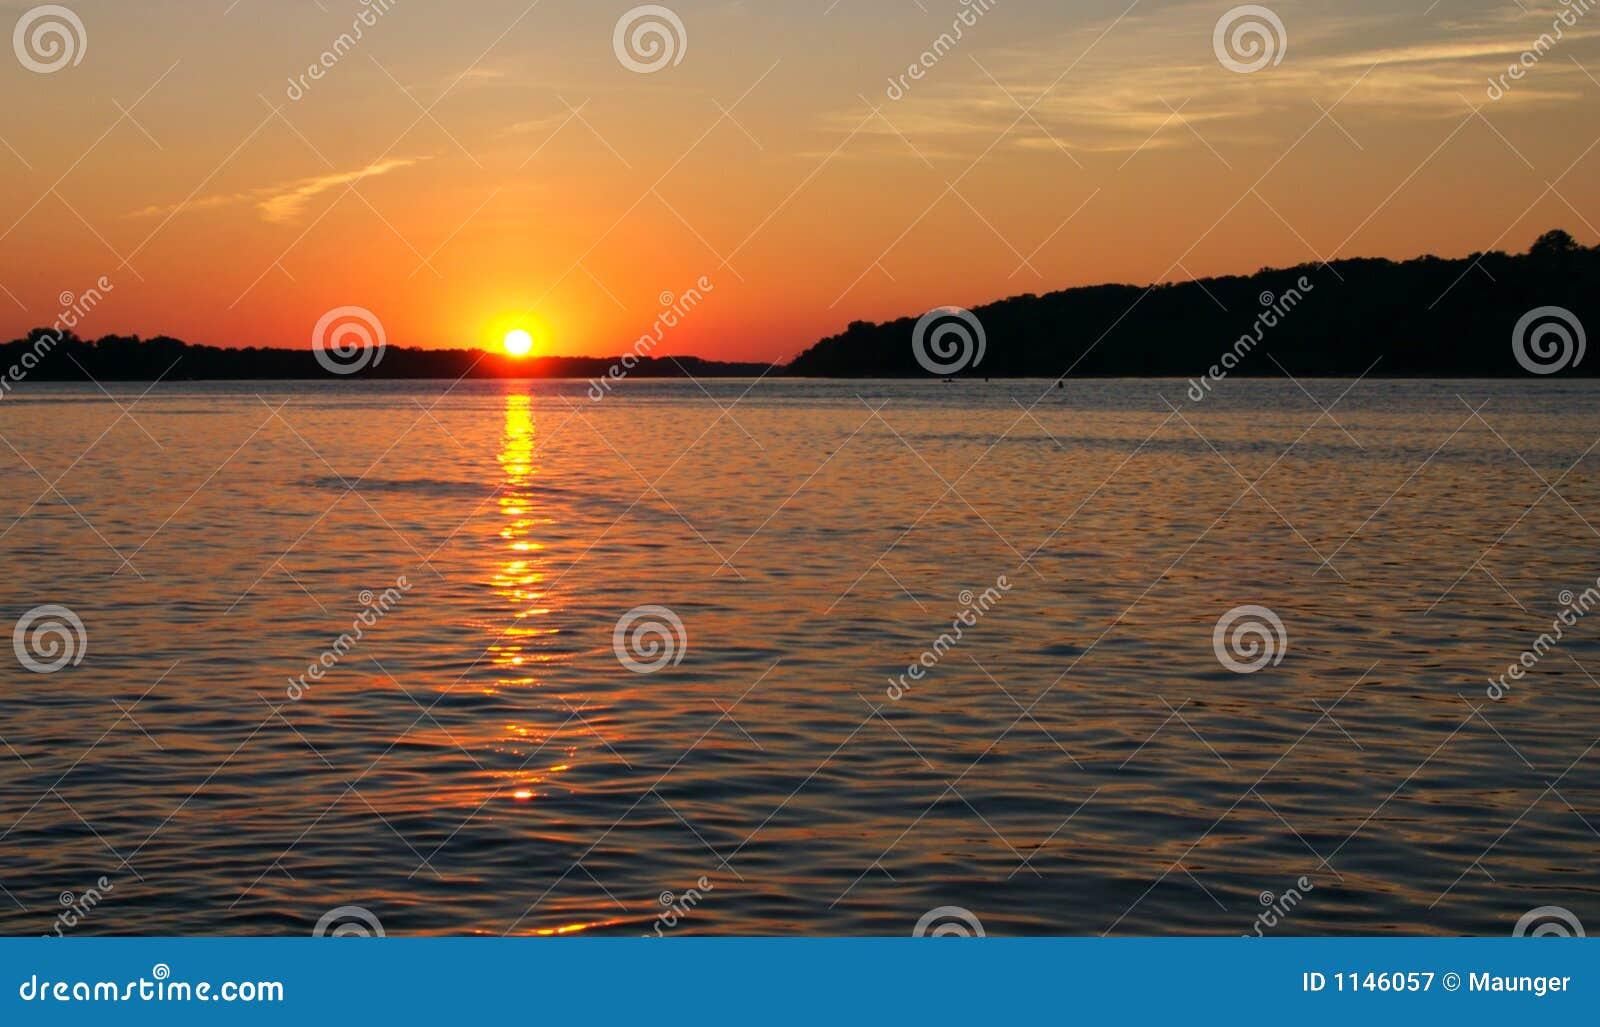 Fluss Mississipi-Sonnenuntergang